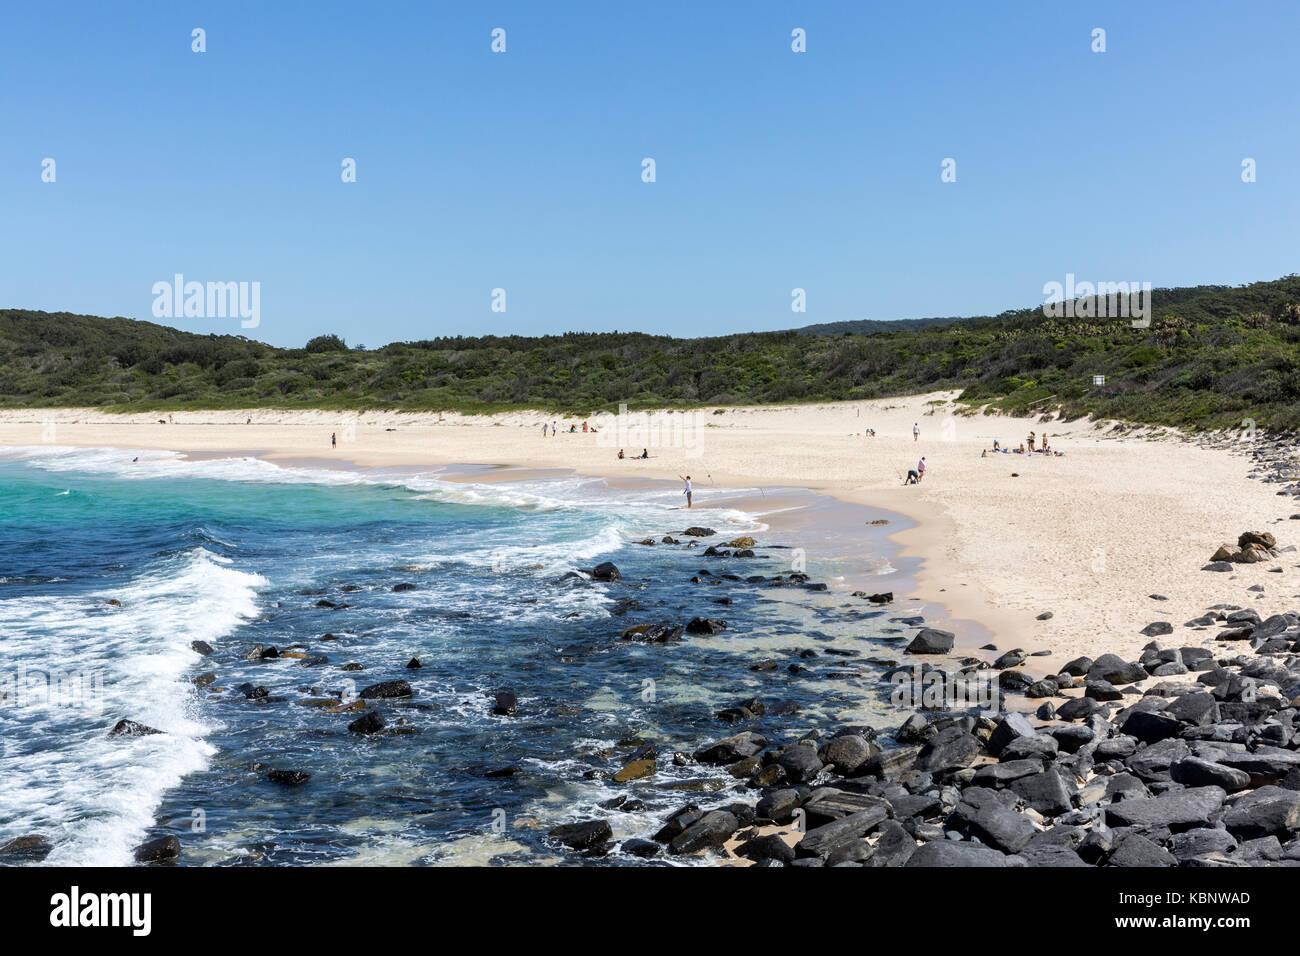 Cellito beach at Sandbar on the mid north coast of new south wales,australia - Stock Image